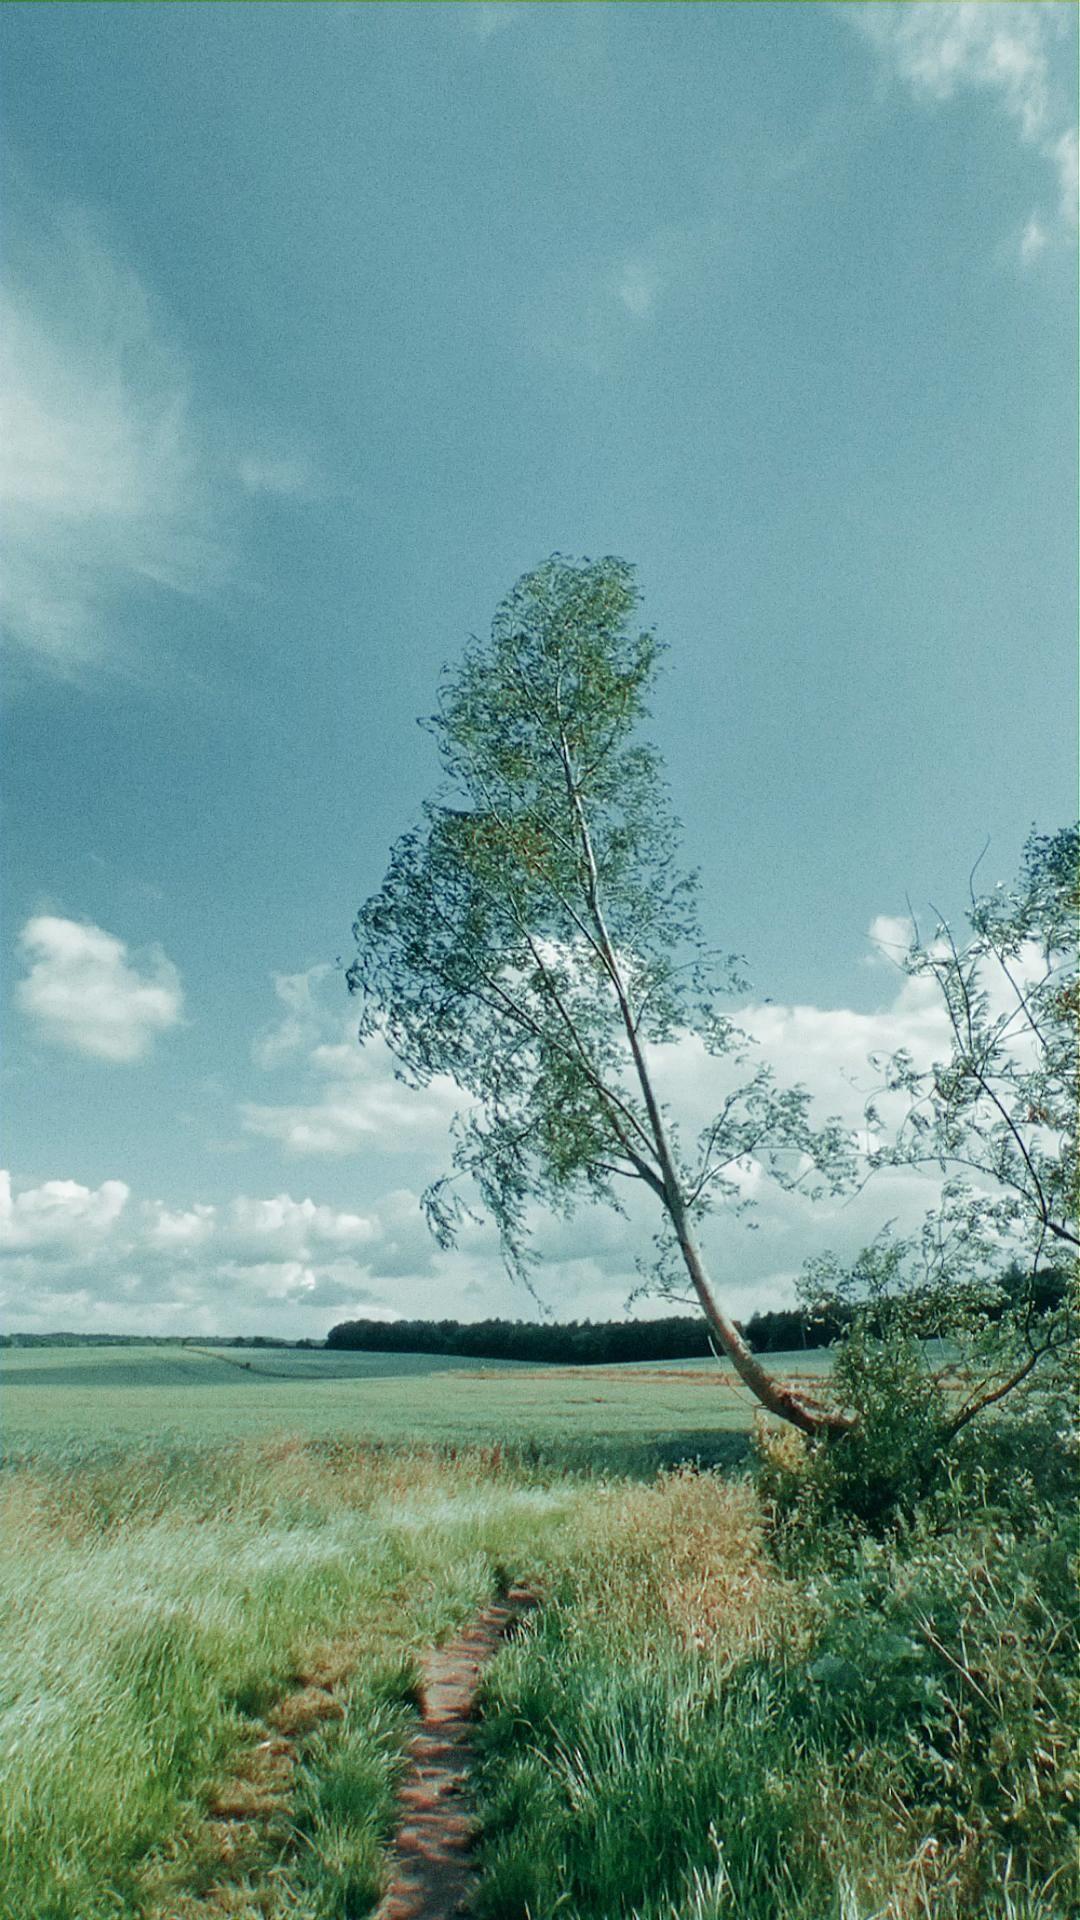 Windy days | Carla Heyworth Photography